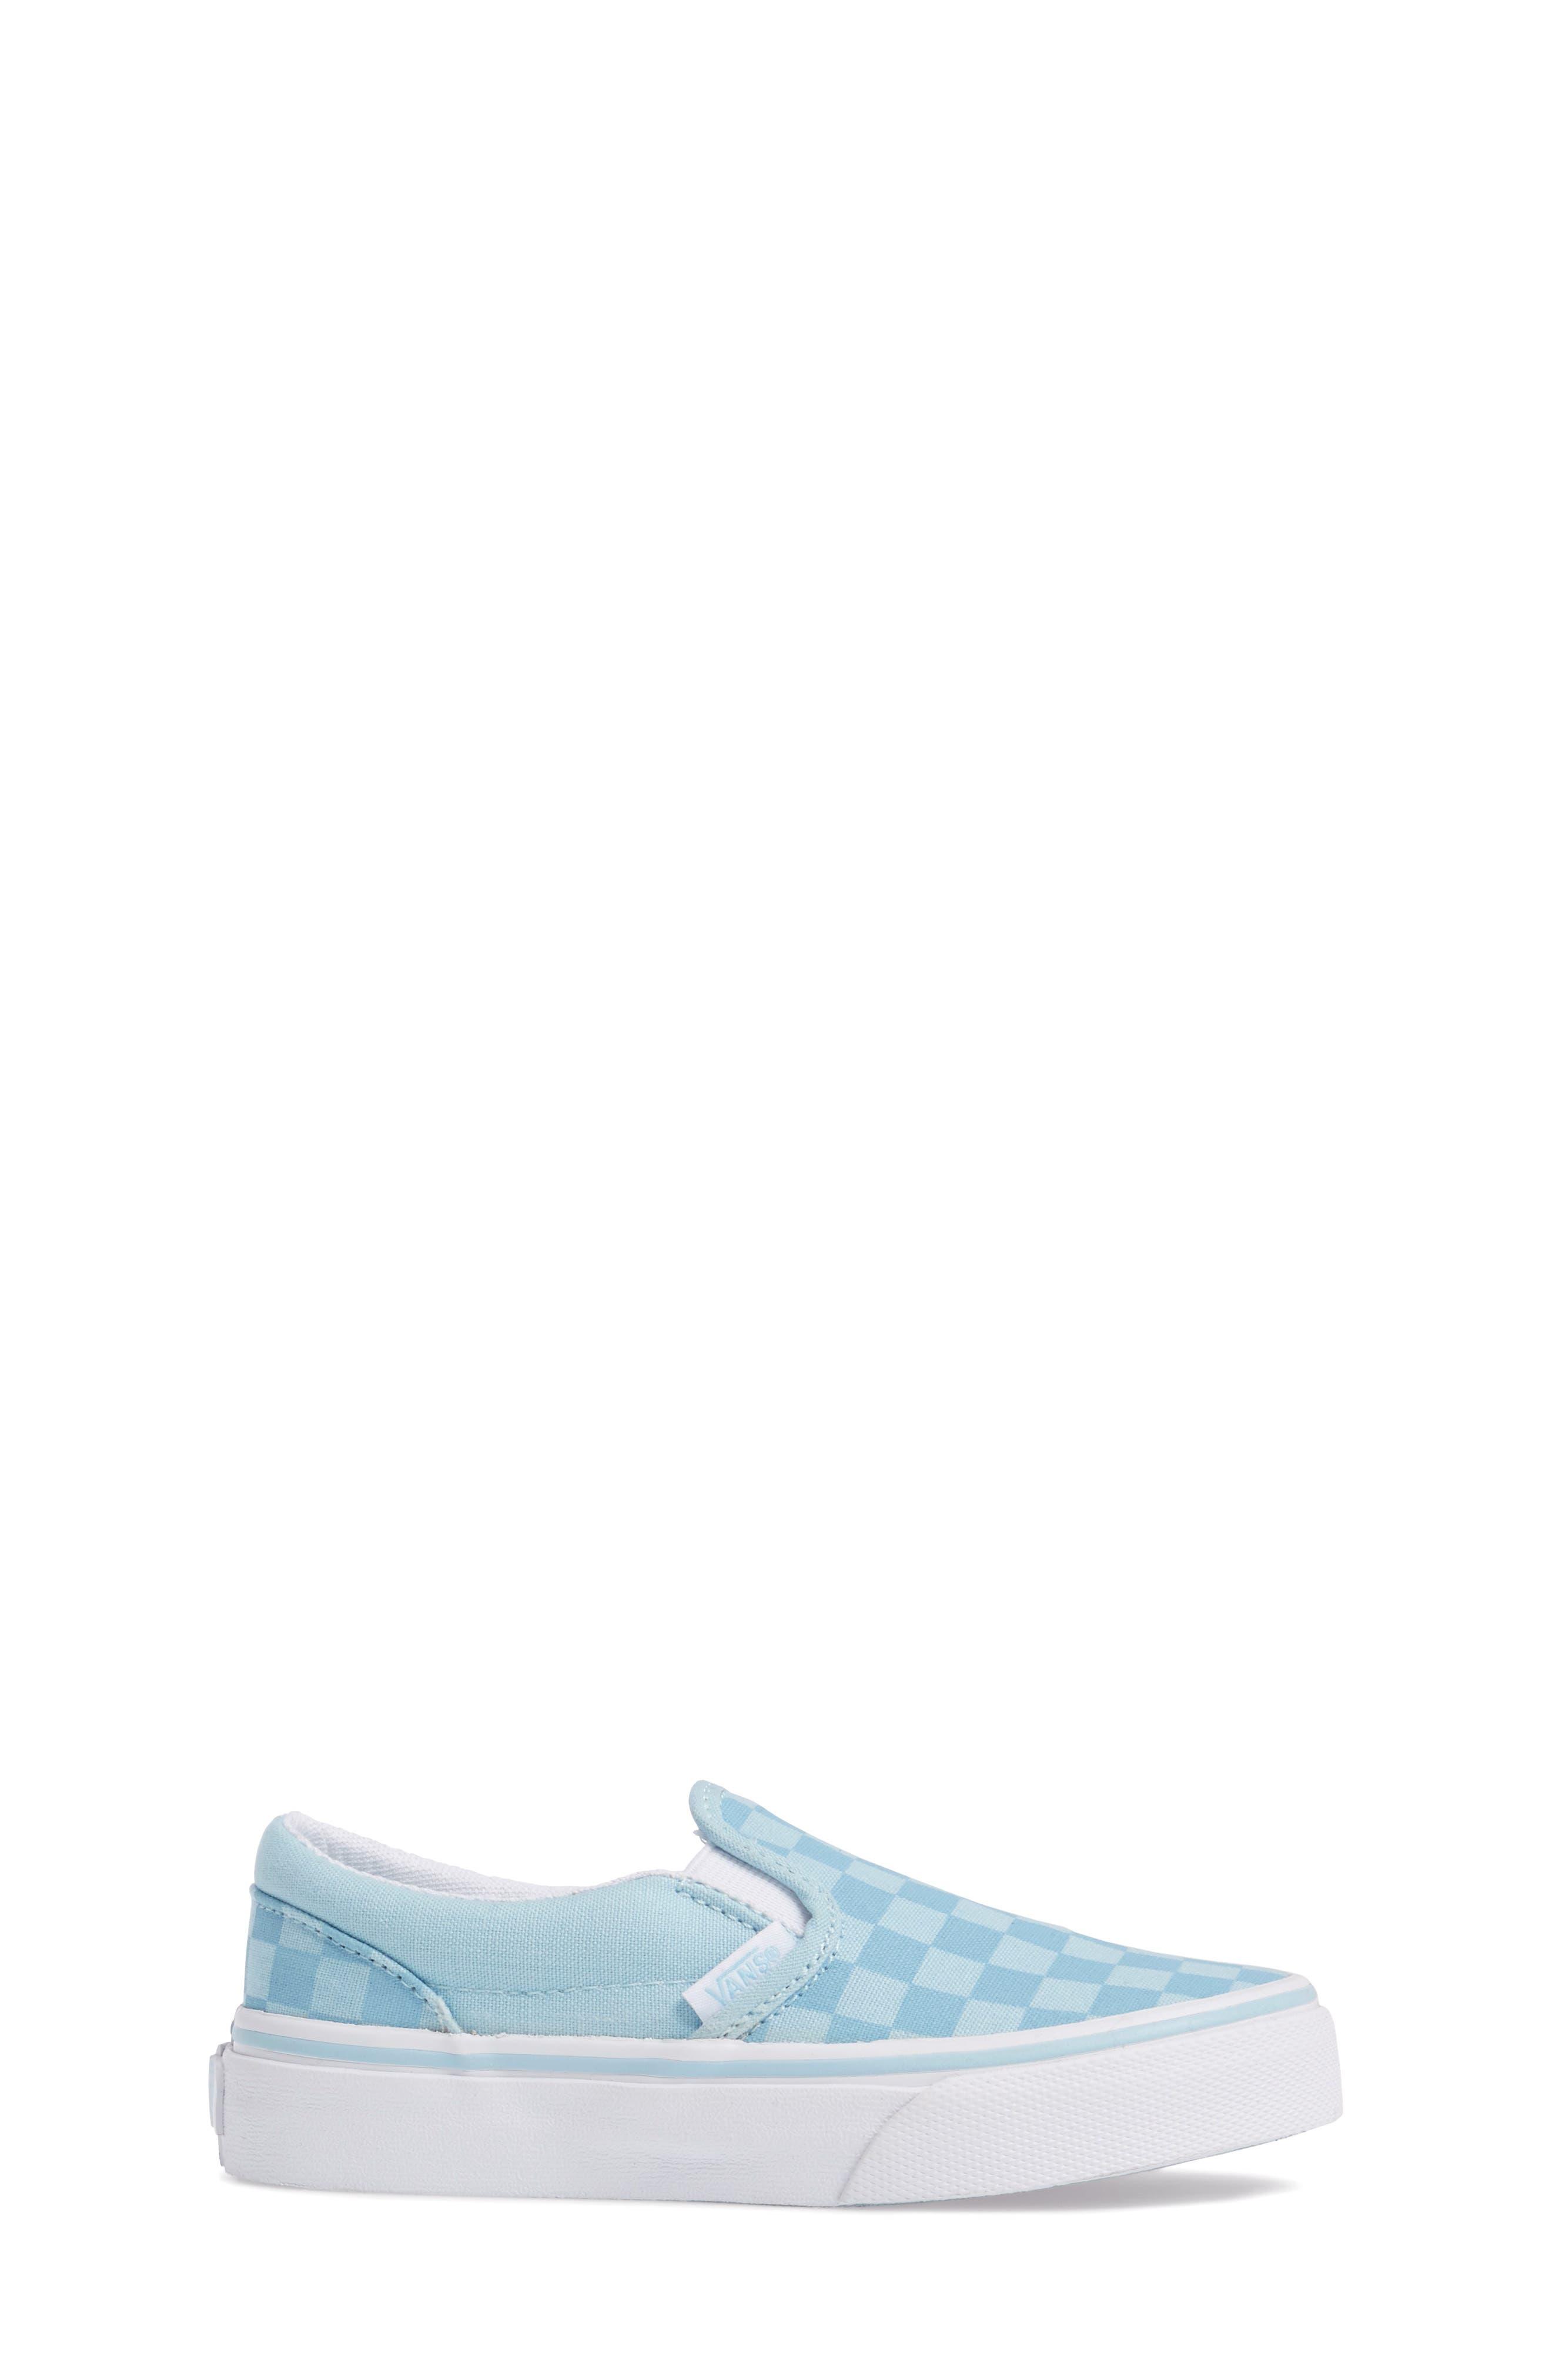 Alternate Image 3  - Vans Classic Slip-On Sneaker (Walker, Toddler, Little Kid & Big Kid)